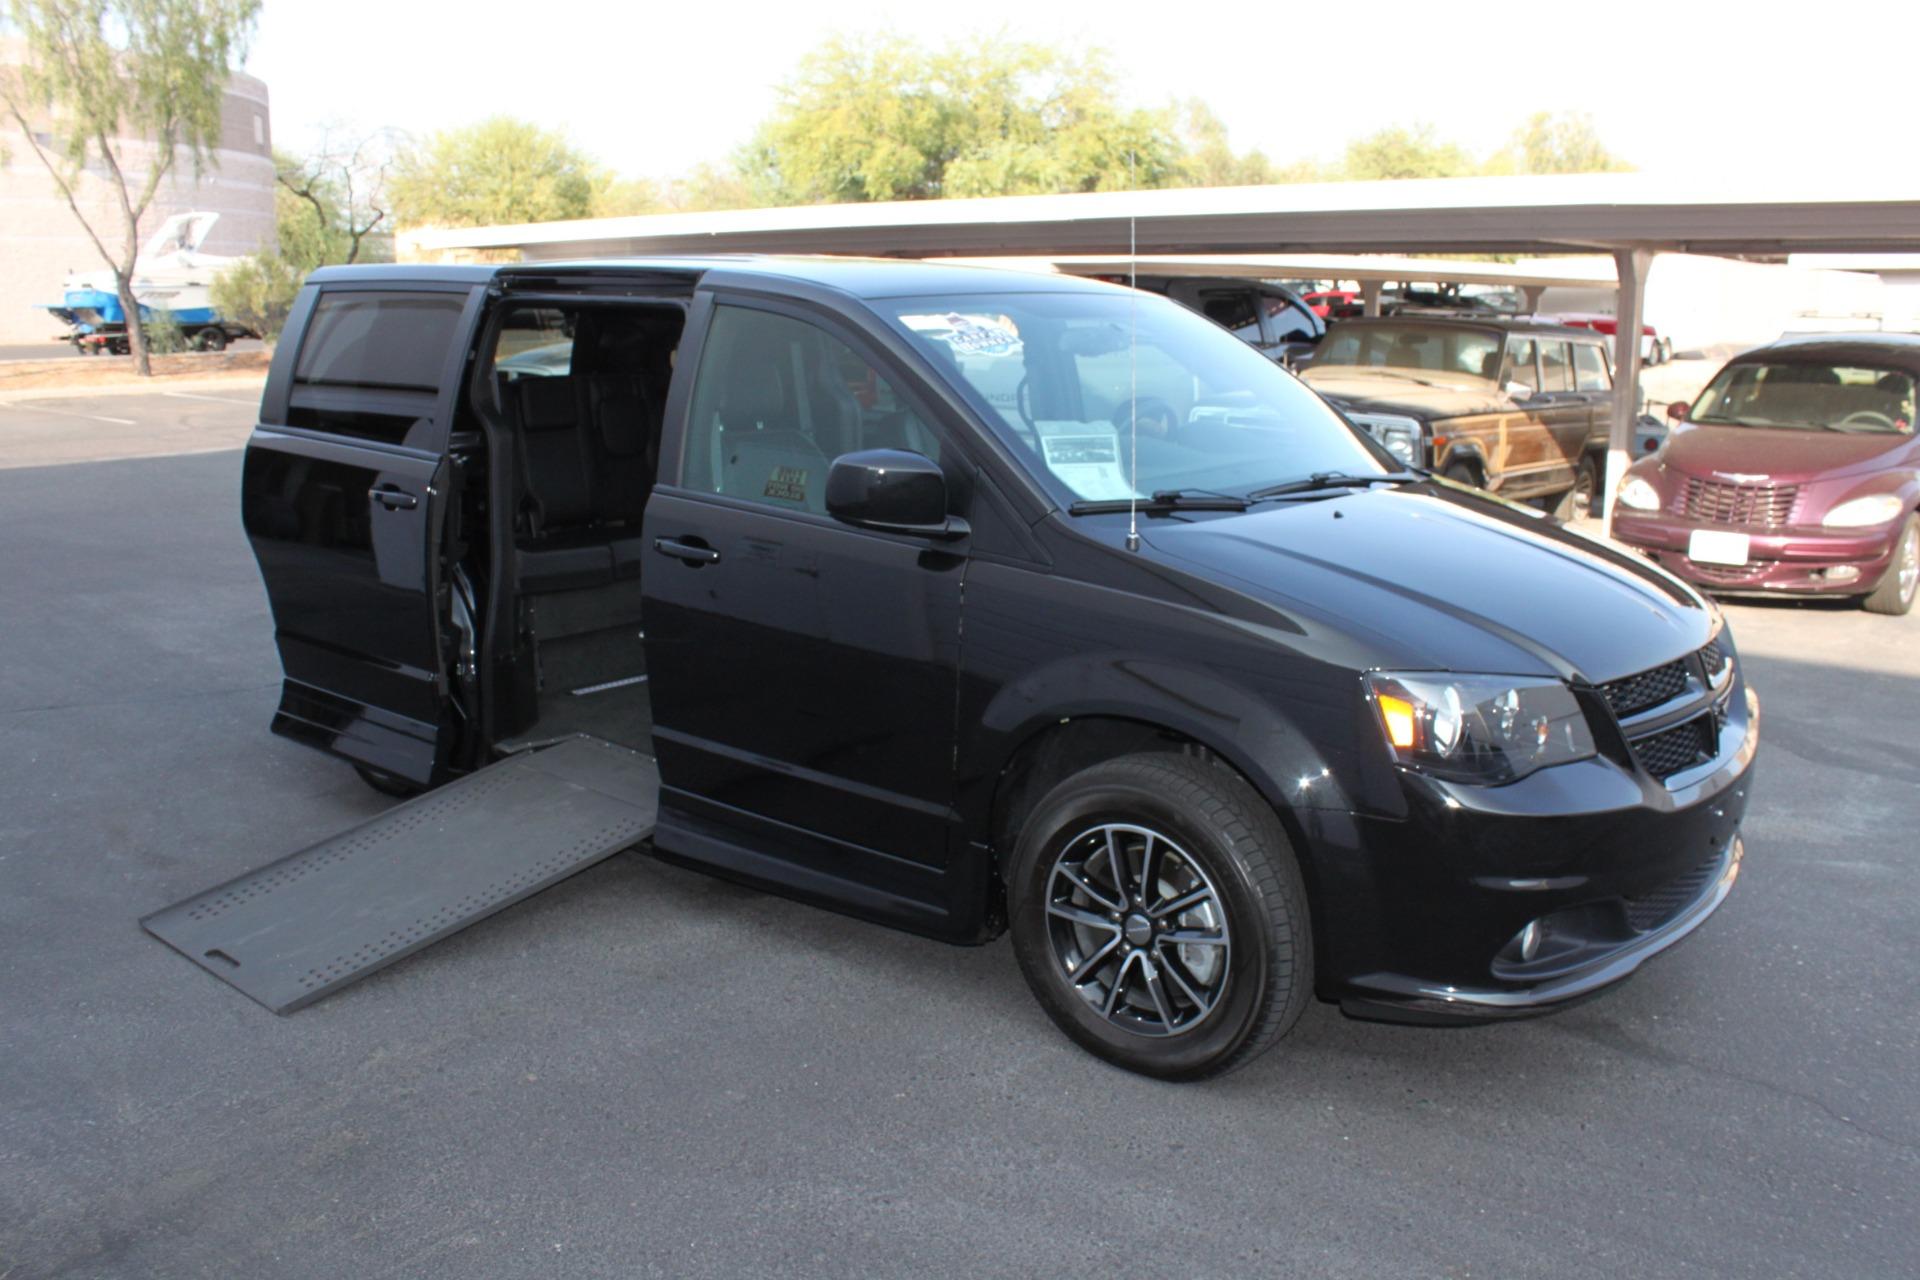 Used-2018-Dodge-Grand-Caravan-SXT-Rollx-Mobility-Conversion-Toyota